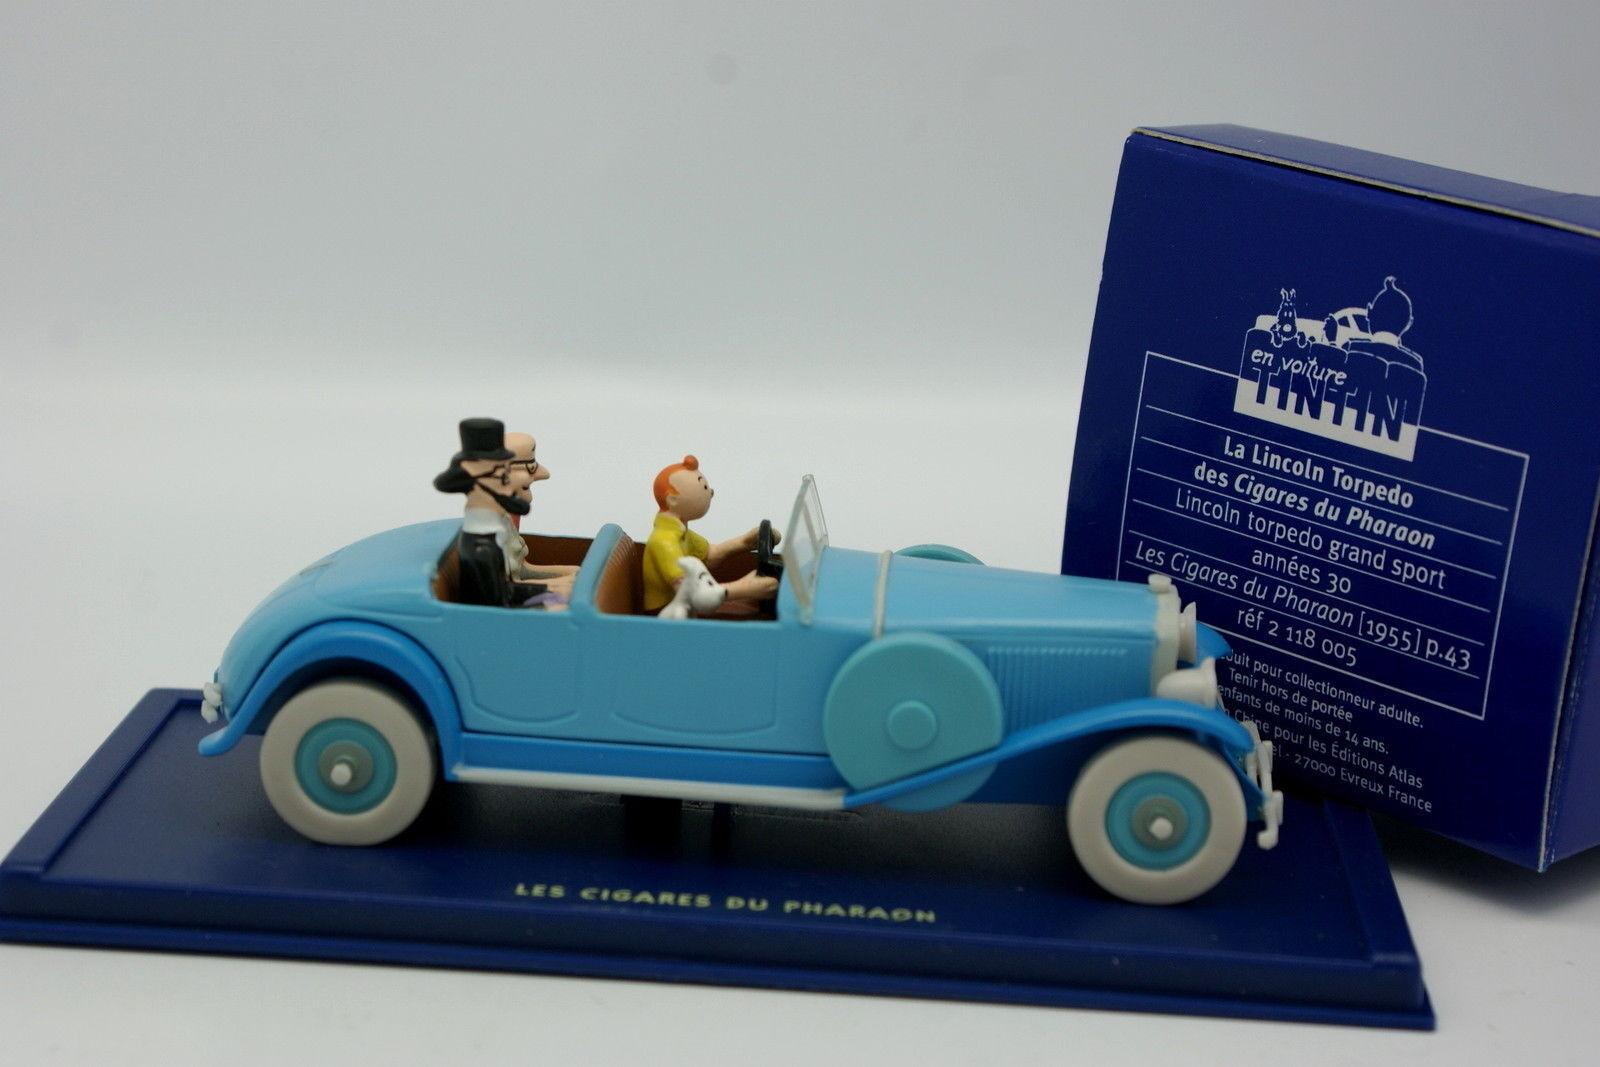 By Car Tintin 1 43 - Lincoln Torpedo - Cigars the Pharaoh